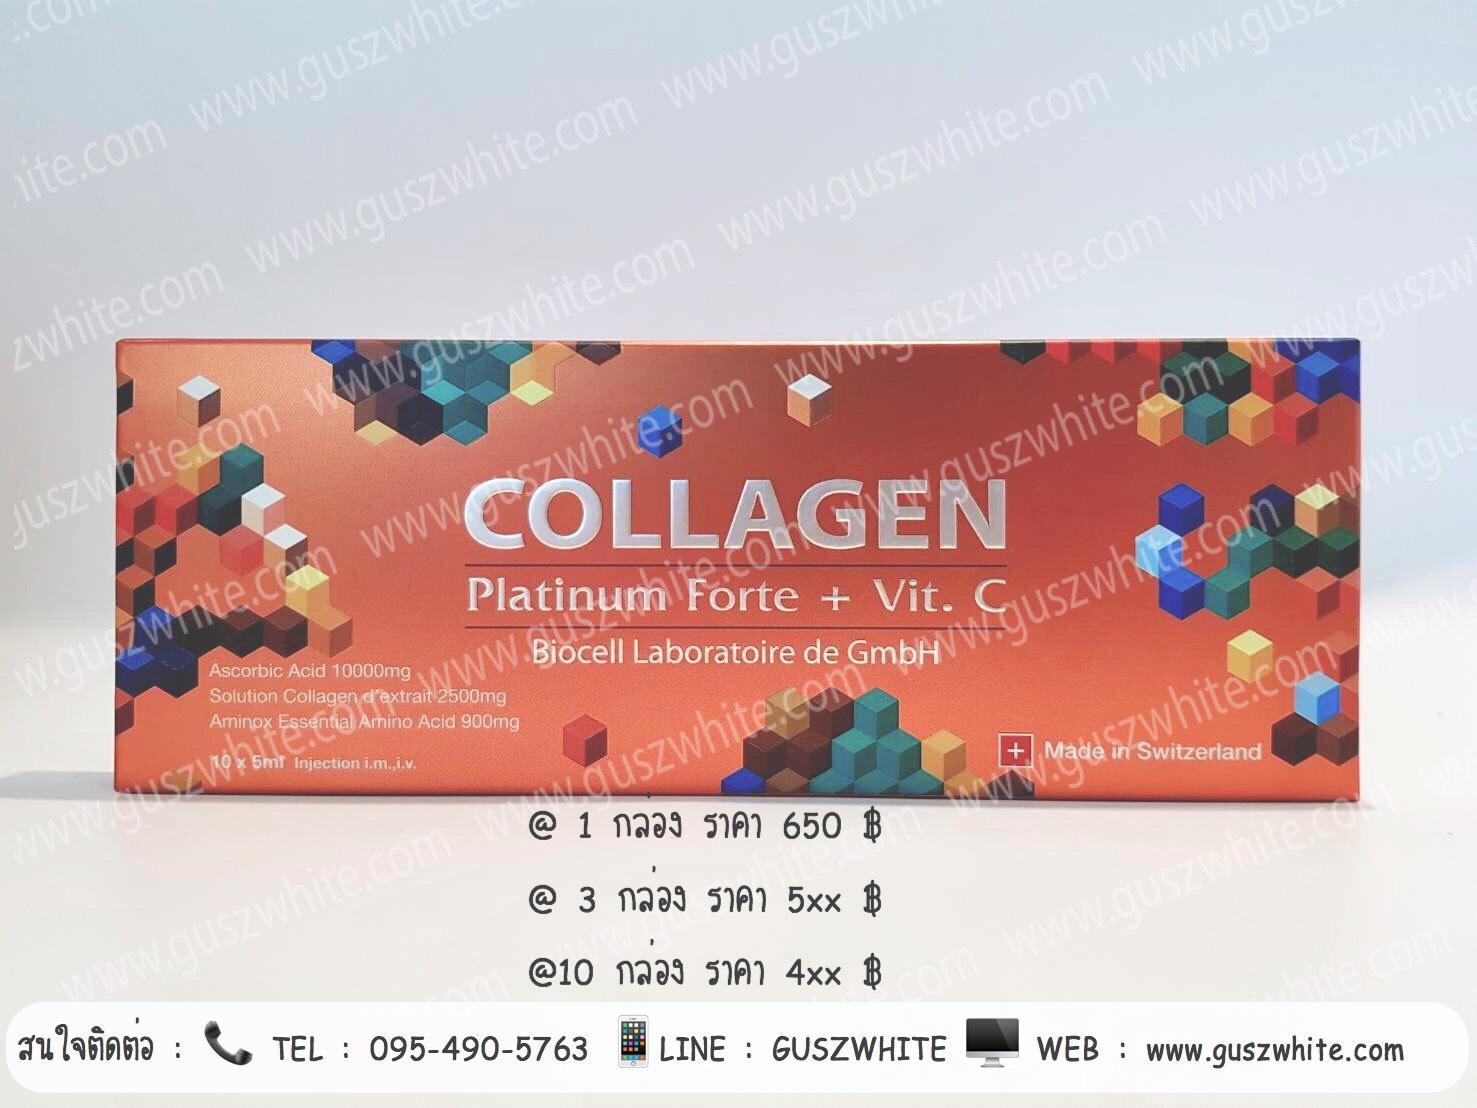 COLLAGEN Platinium Forte+Vit C BIOCELL (Swiss)